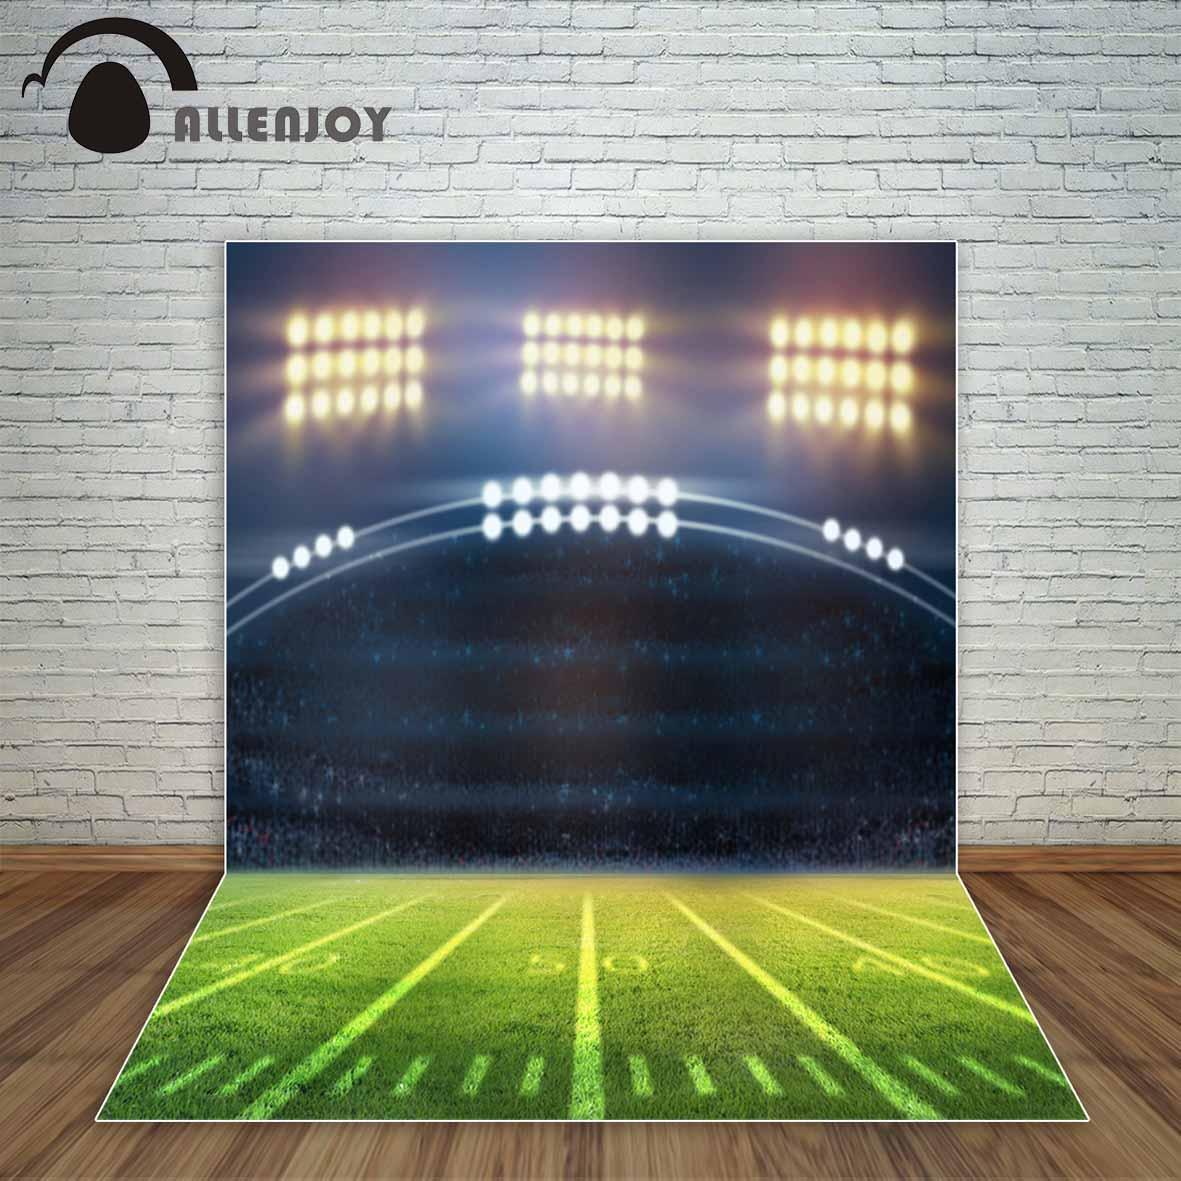 Allenjoy stadium and spotlight grassland American Football field backdrop camera photographic professional